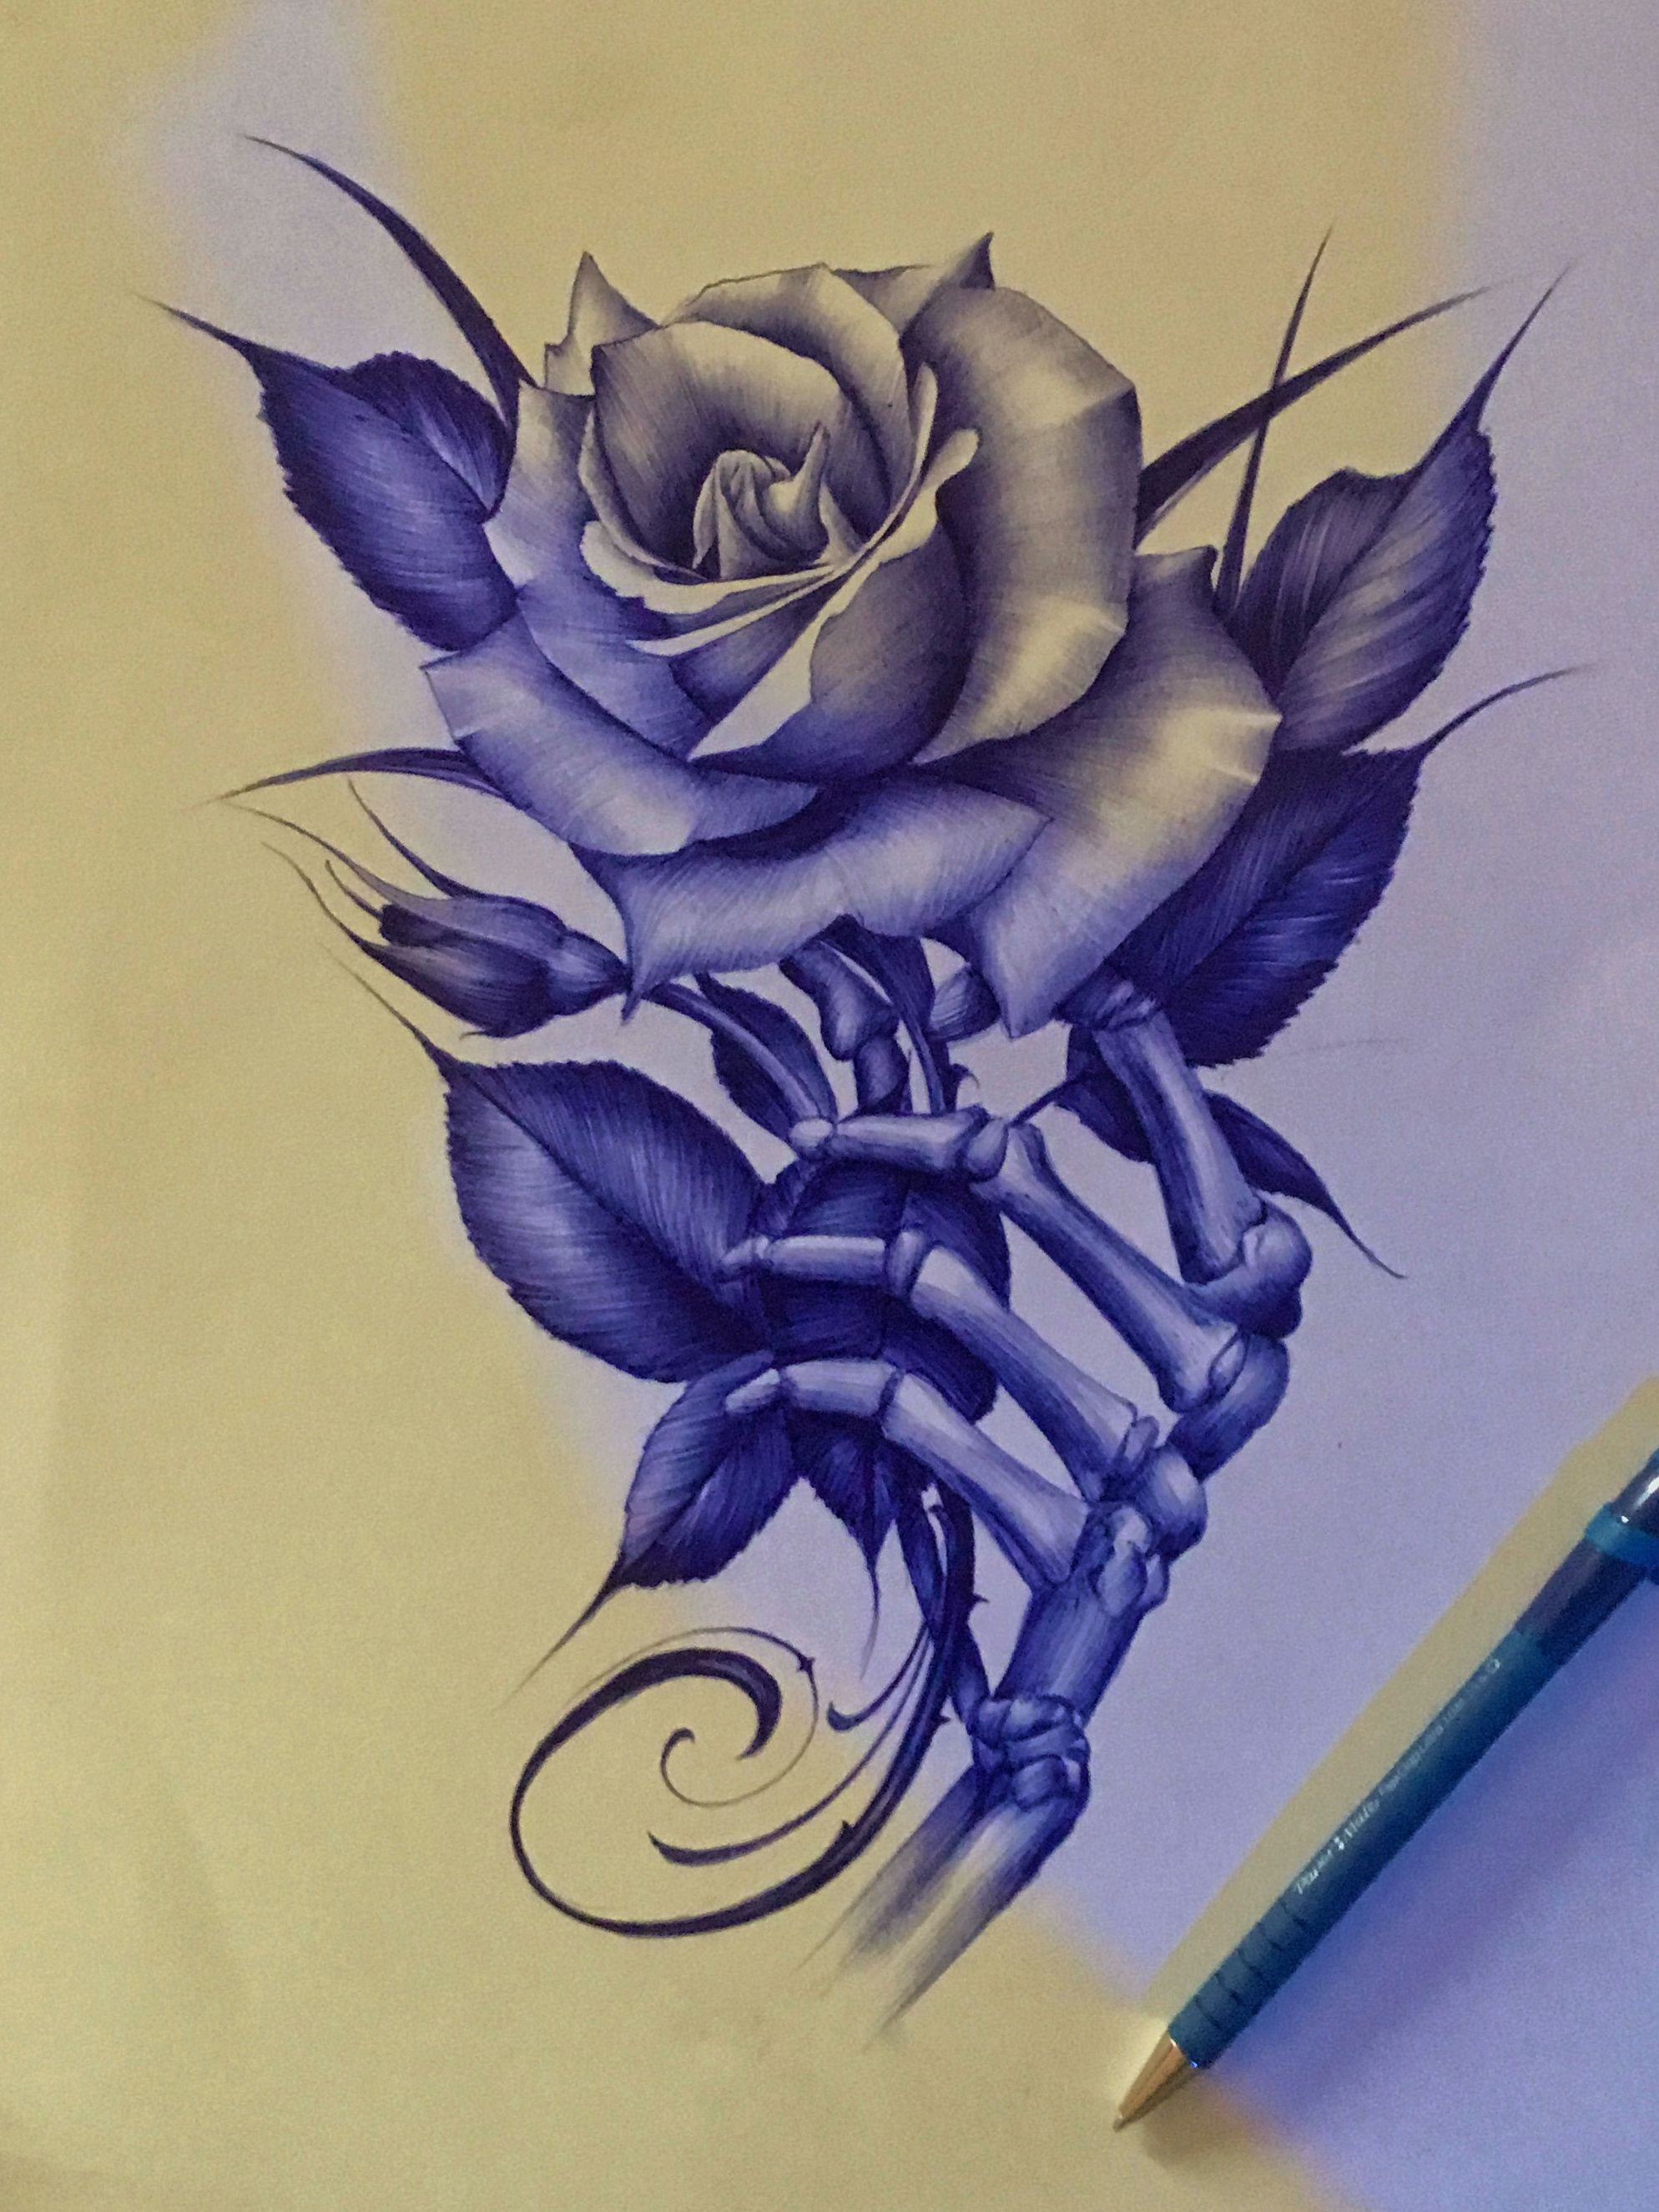 Pin oleh hongtie di tattoos pinterest tatouage dessin rose dan dessin - Dessin de rose ...